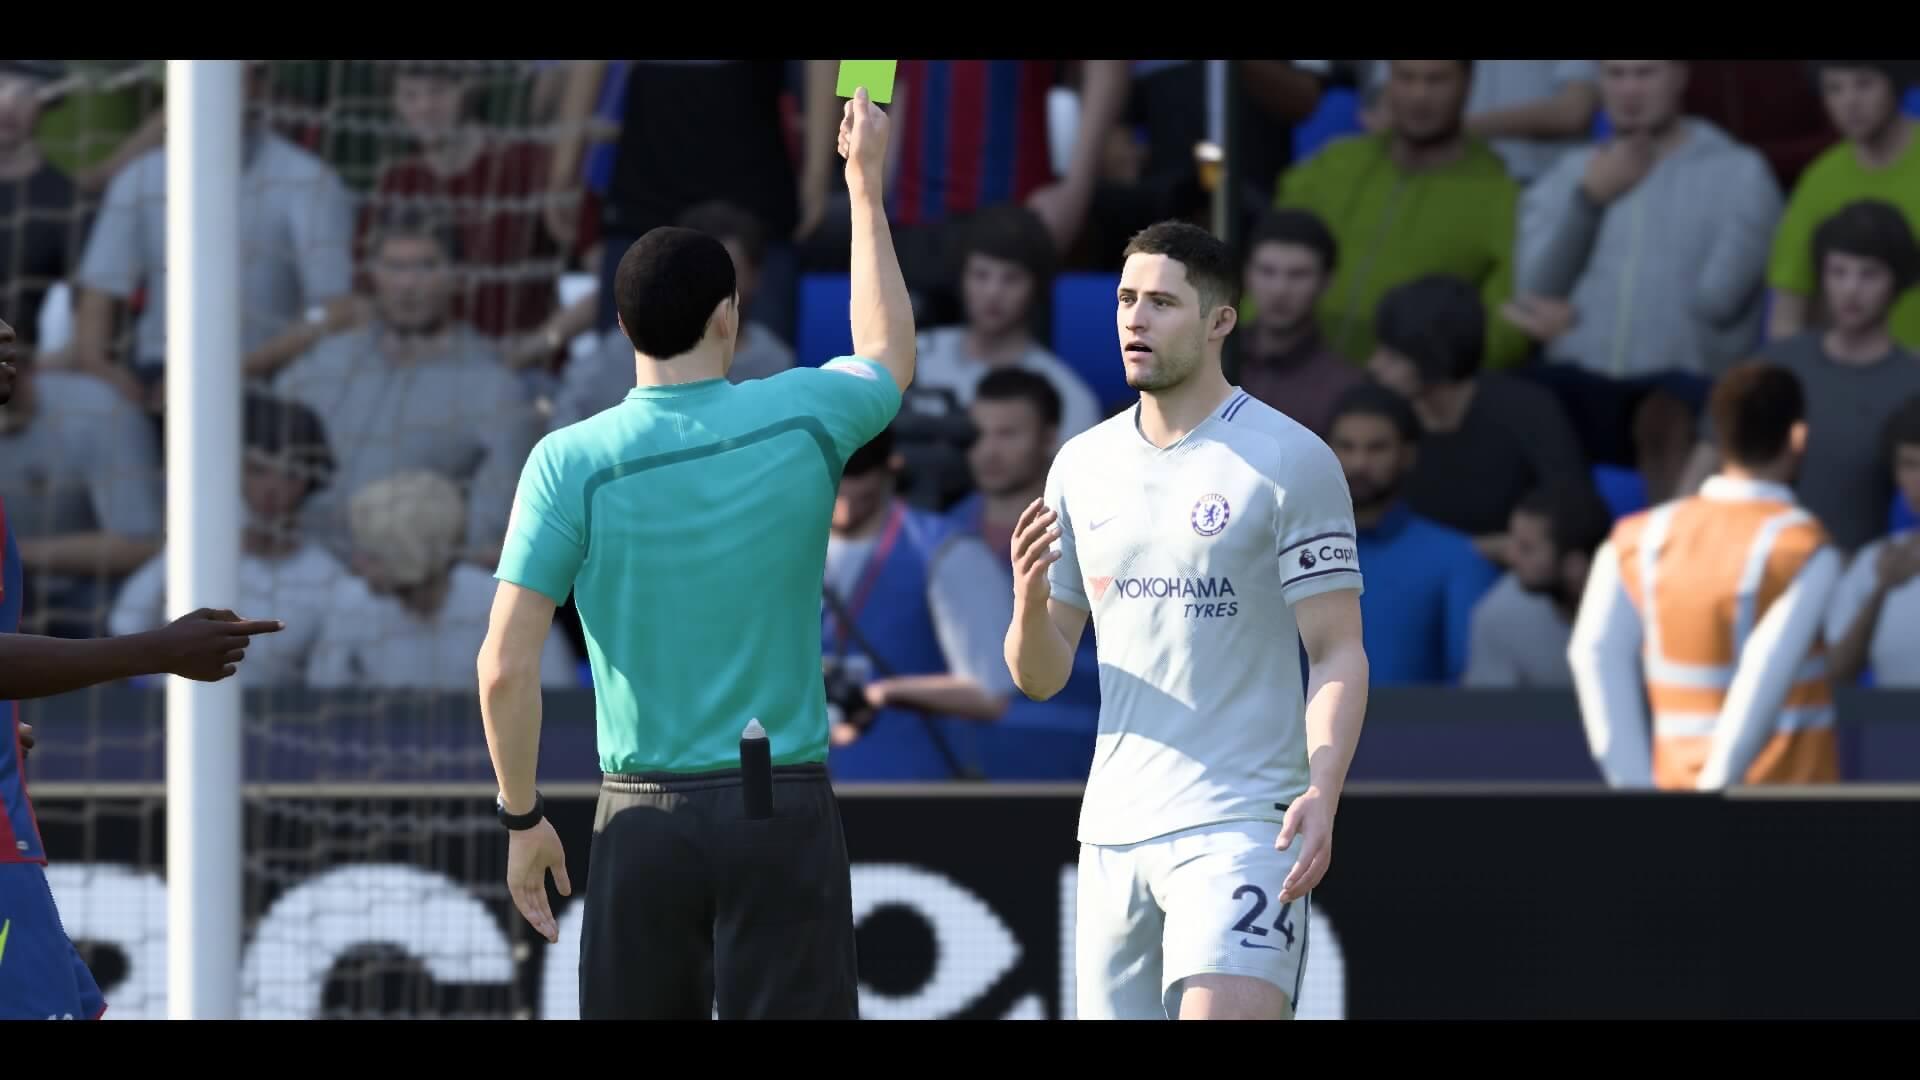 FIFA 18 Jogo Rápido 0-1 CRY X CHE, 1º tp